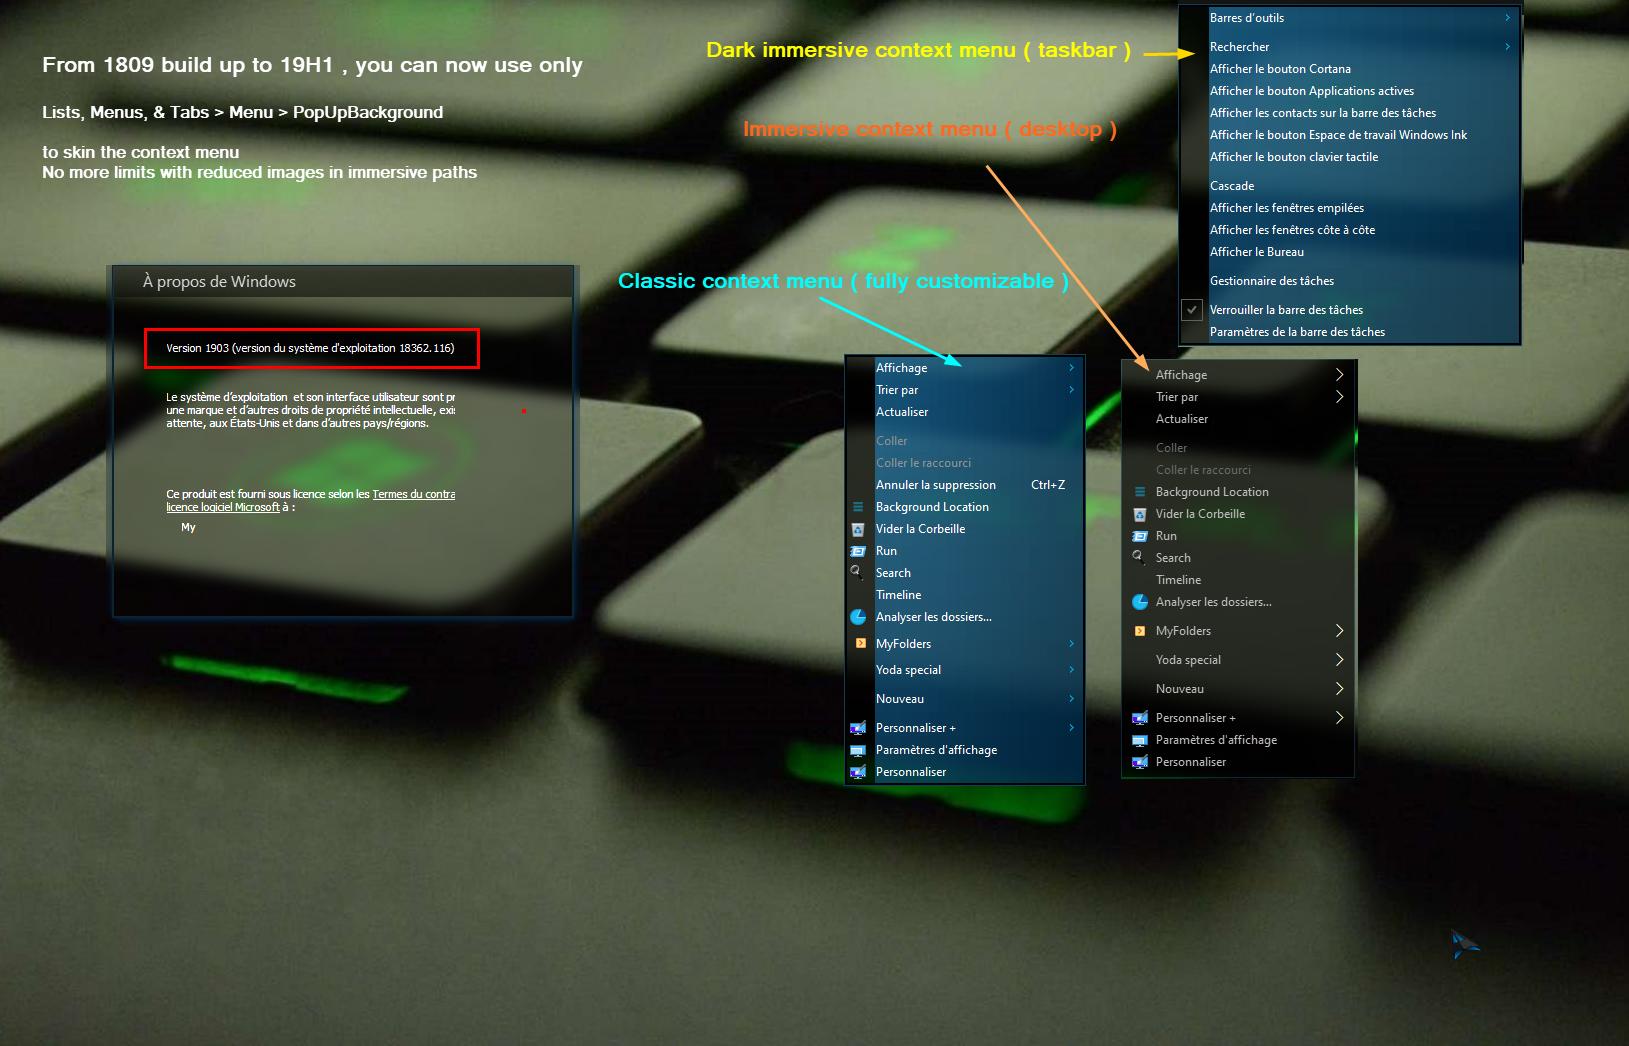 1809 Menu bringing back classic desktop context menu for 19h1 ++